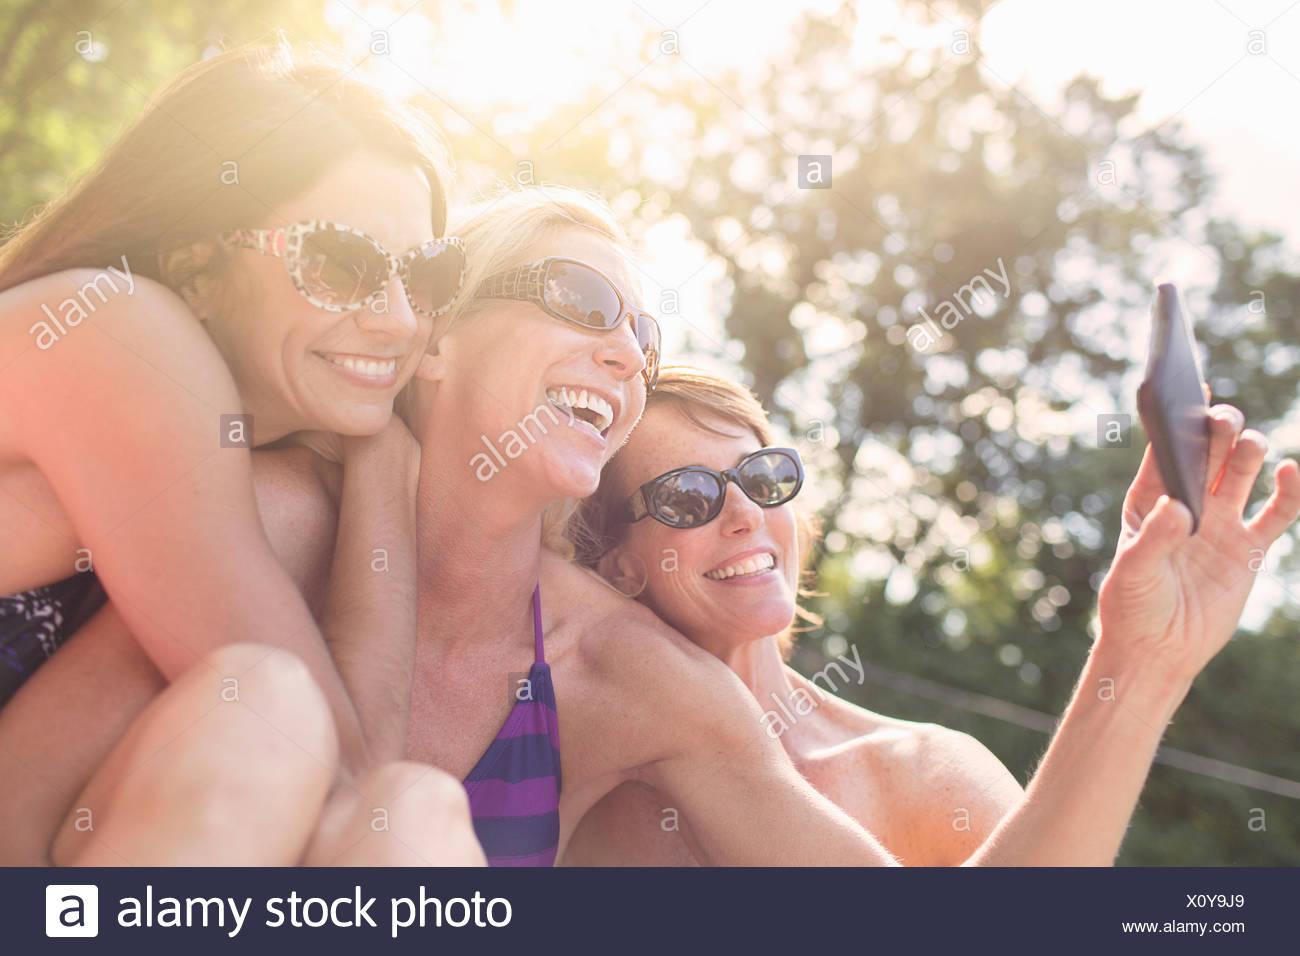 Three mature women in swimwear, taking self portrait - Stock Image